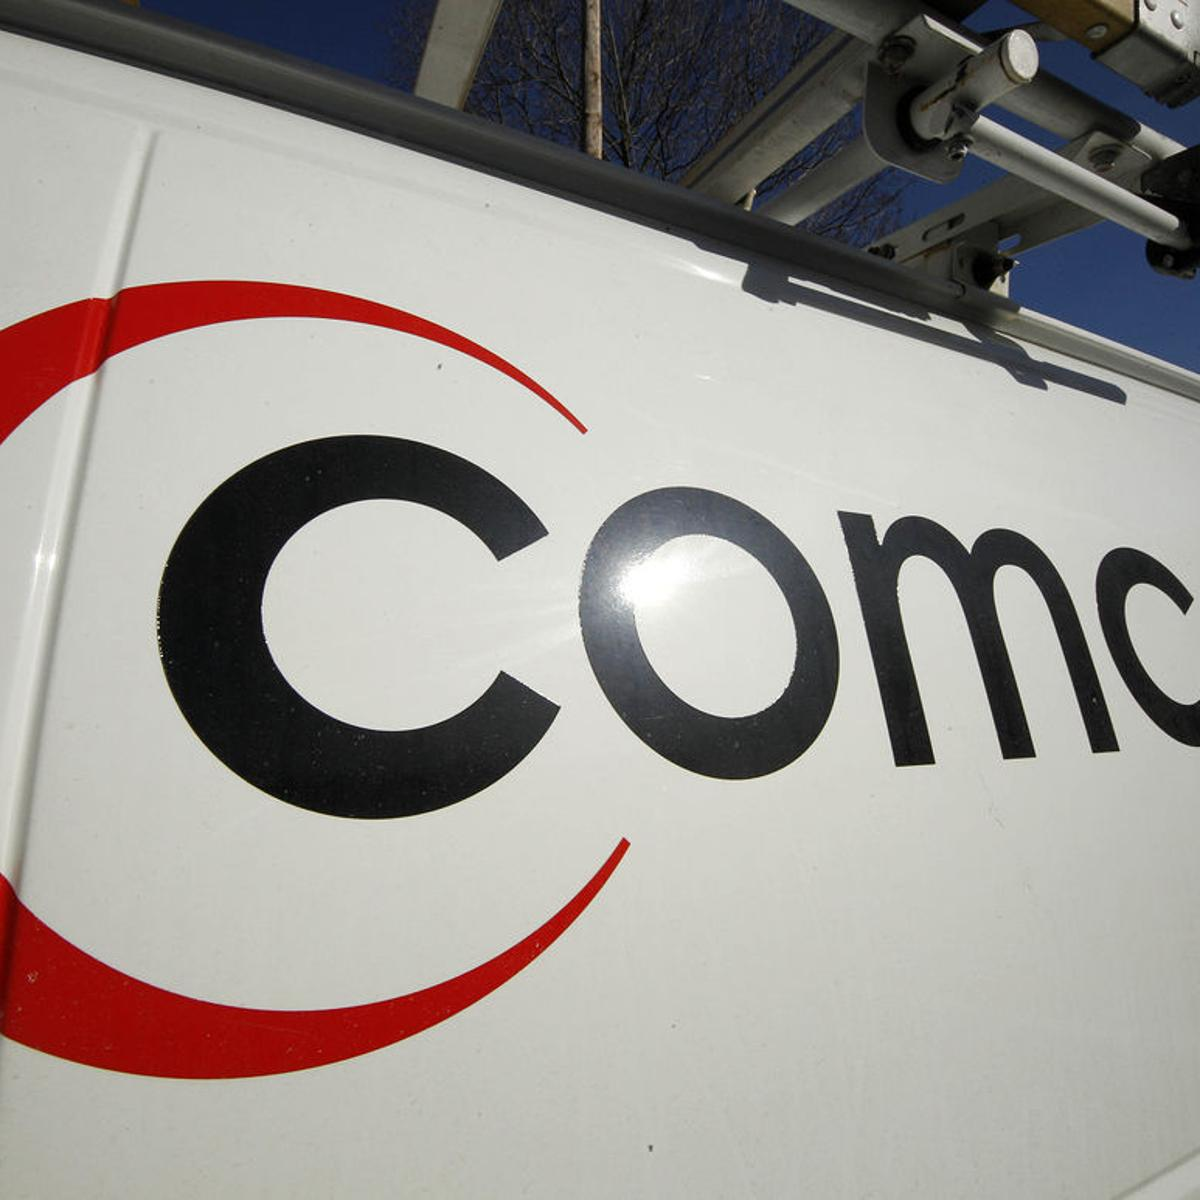 Comcast increasing download speeds | Business, Finance